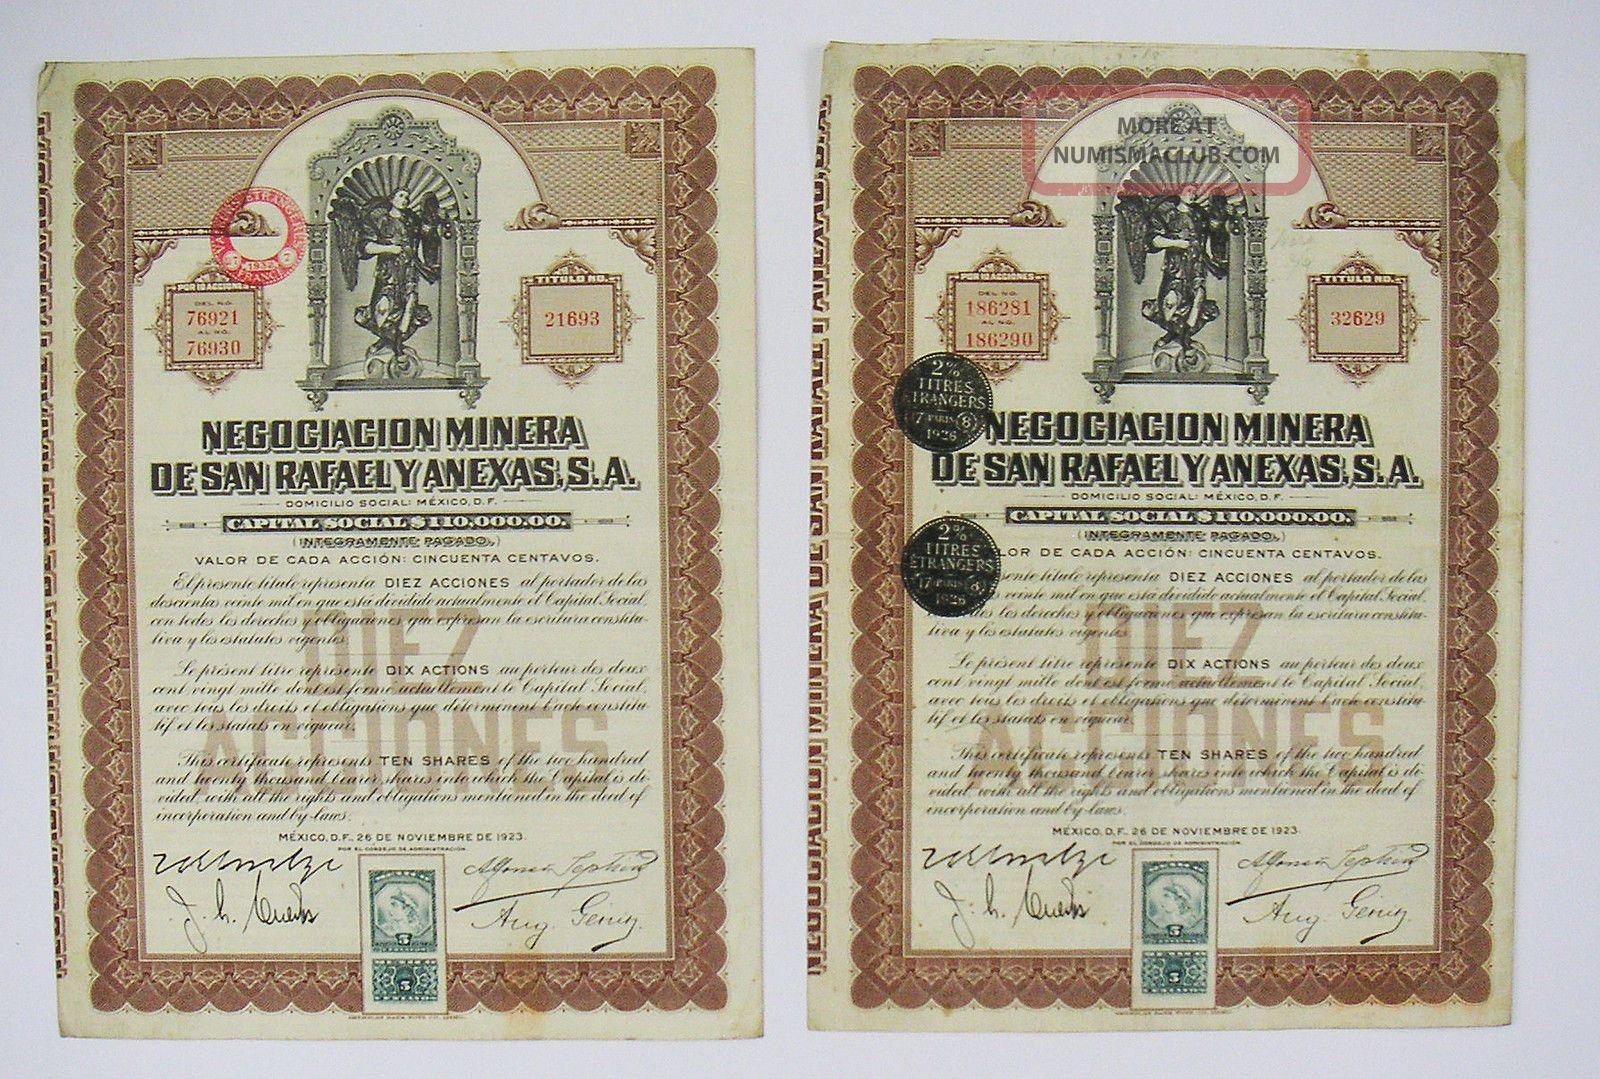 Mexico - Negociacion Minera De San Rafael Y Anexas 10 Shares 1923 (x2) Stocks & Bonds, Scripophily photo